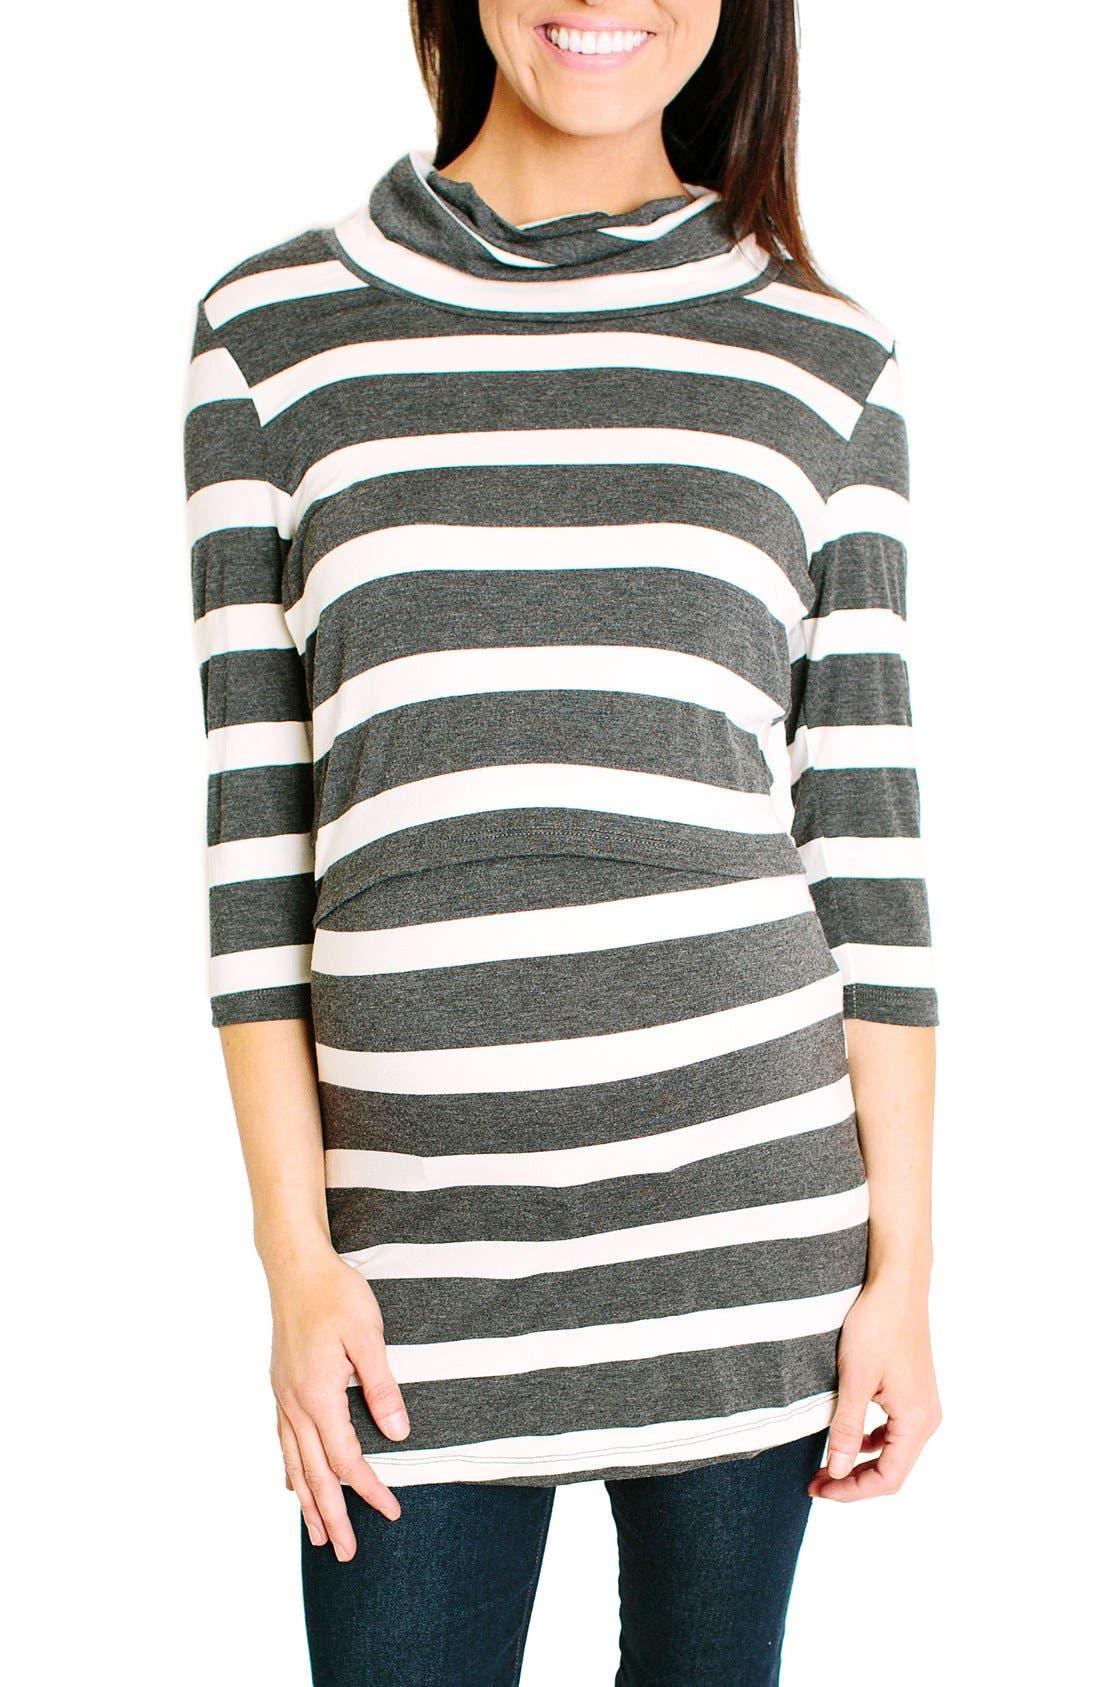 NOM Shelley Maternity/Nursing Turtleneck Tunic,                         Main,                         color, Charcoal Wide Stripe